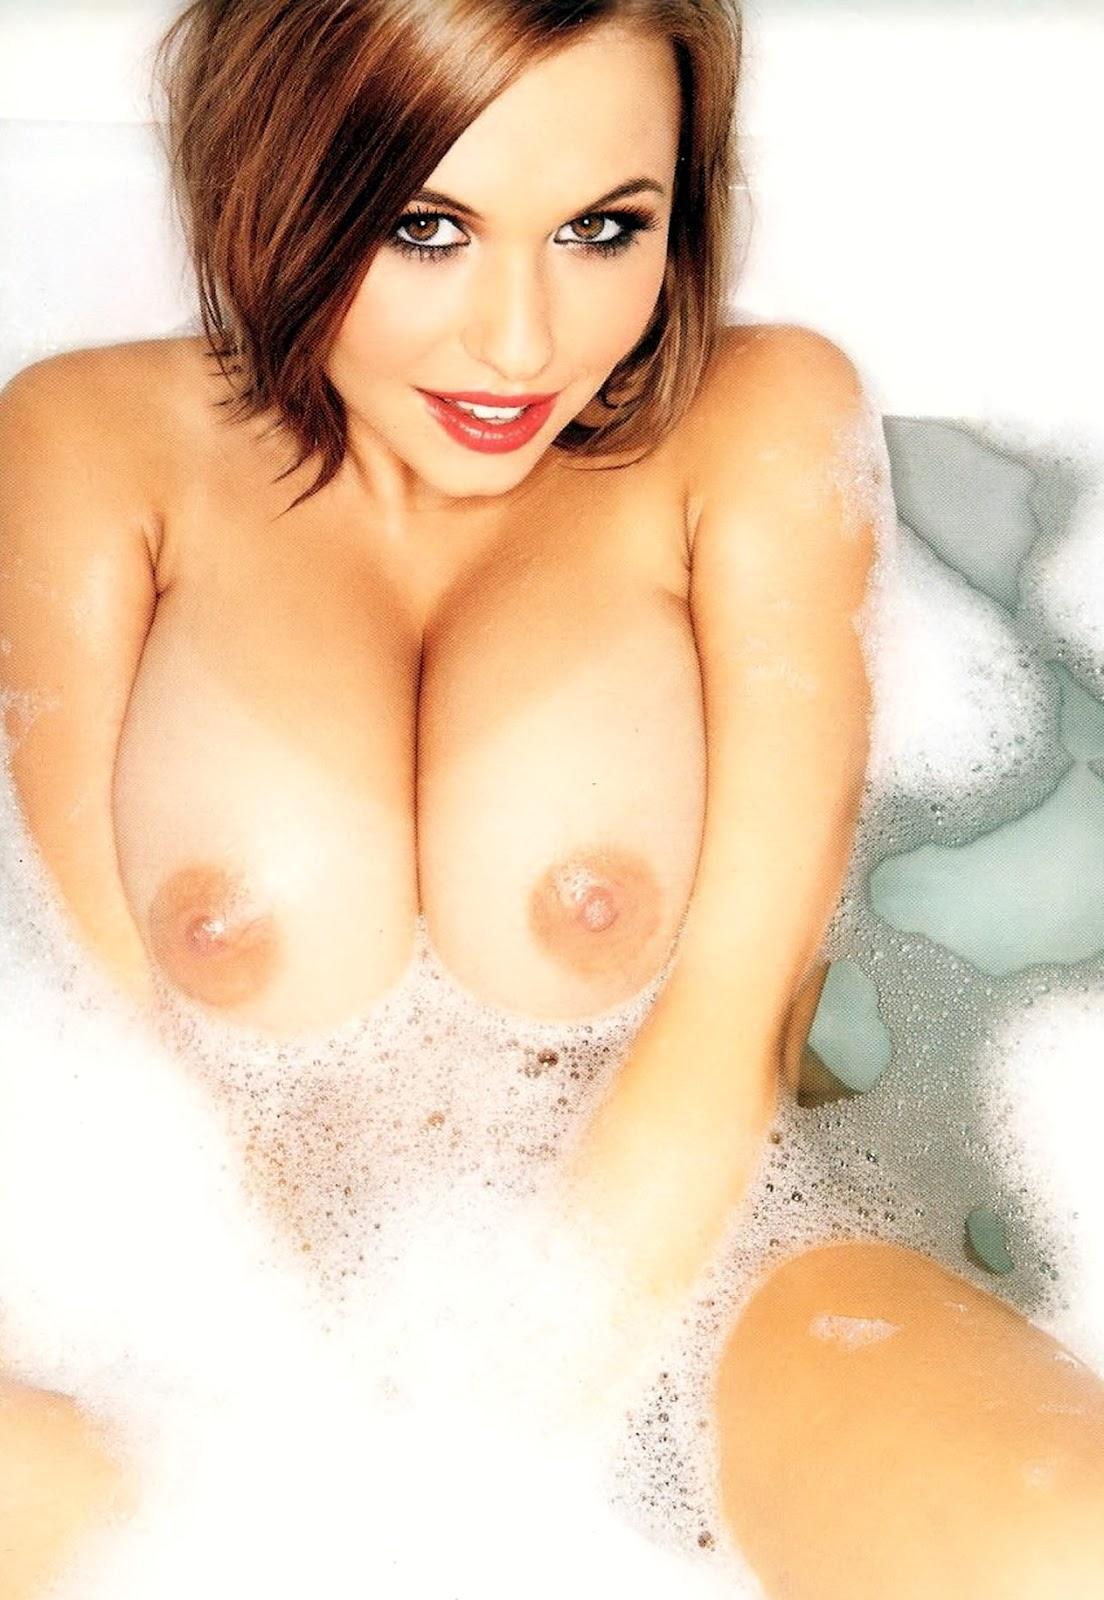 magnificent boobs